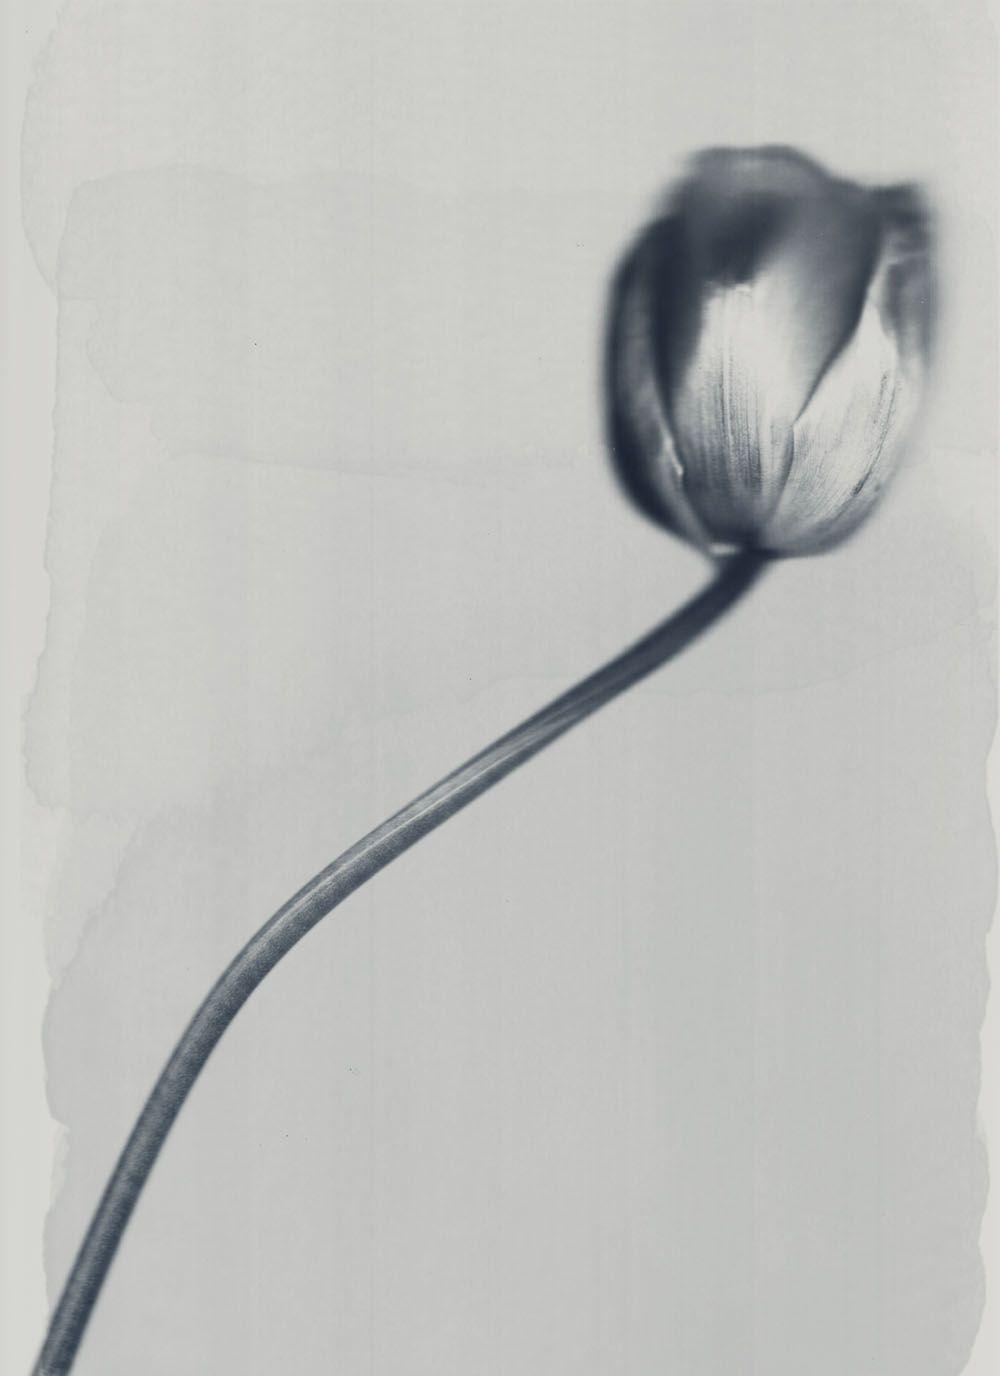 Silver tulip, alternative photography, alternative processing via digital darkroom, texture created by hand via artist grade materials.